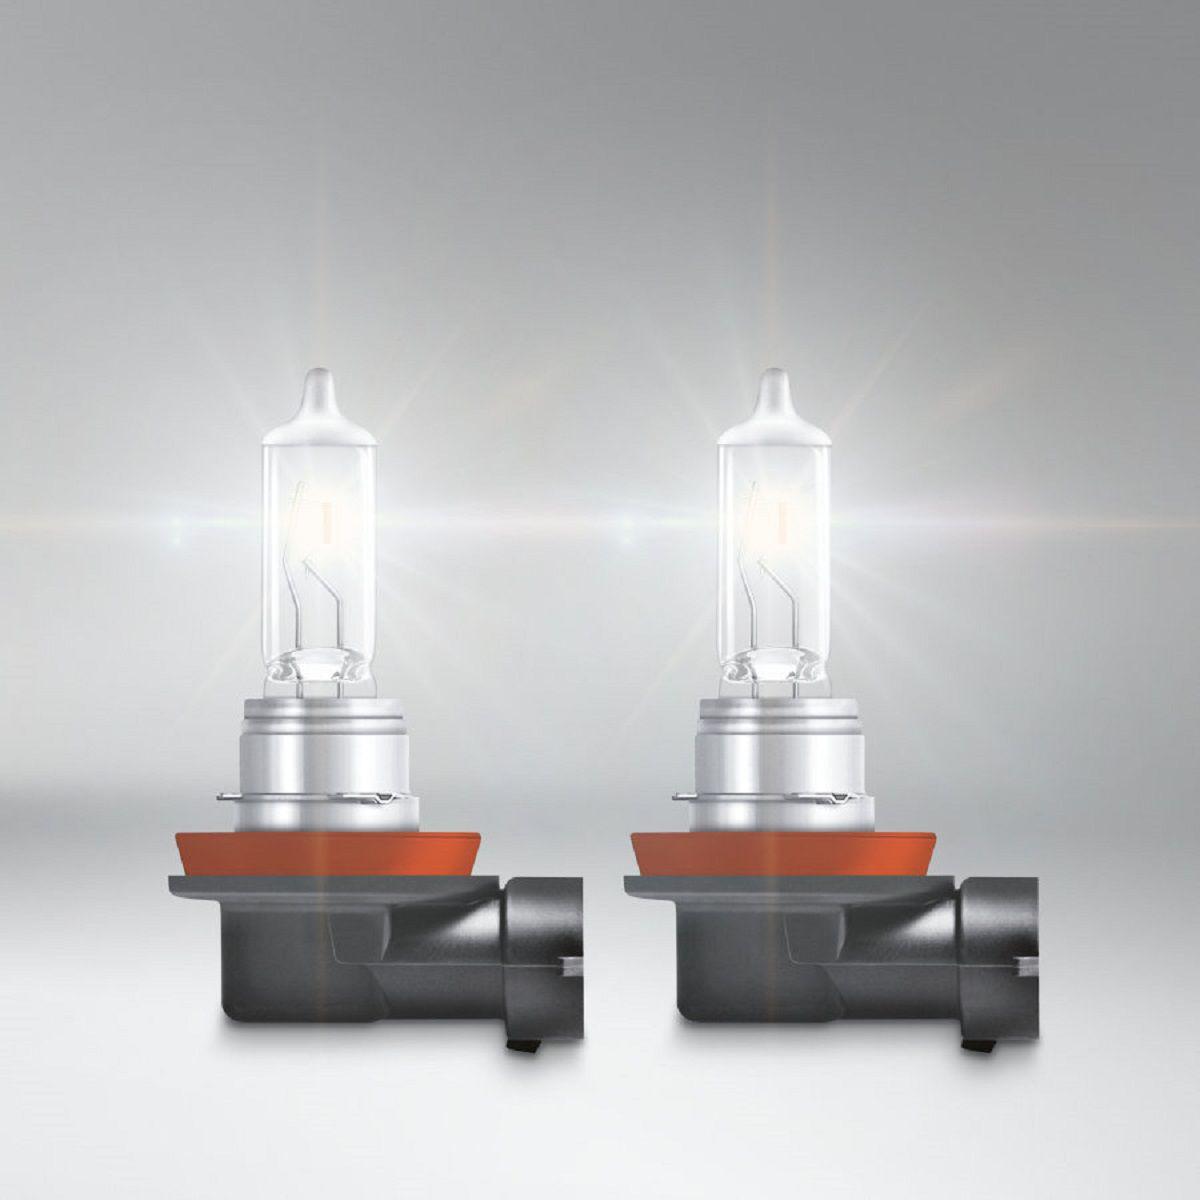 Lampada Farol Carro Osram Night Breaker Silver Par H11 100% + Luz 3.200k  - Rea Comércio - Sua Loja Completa!